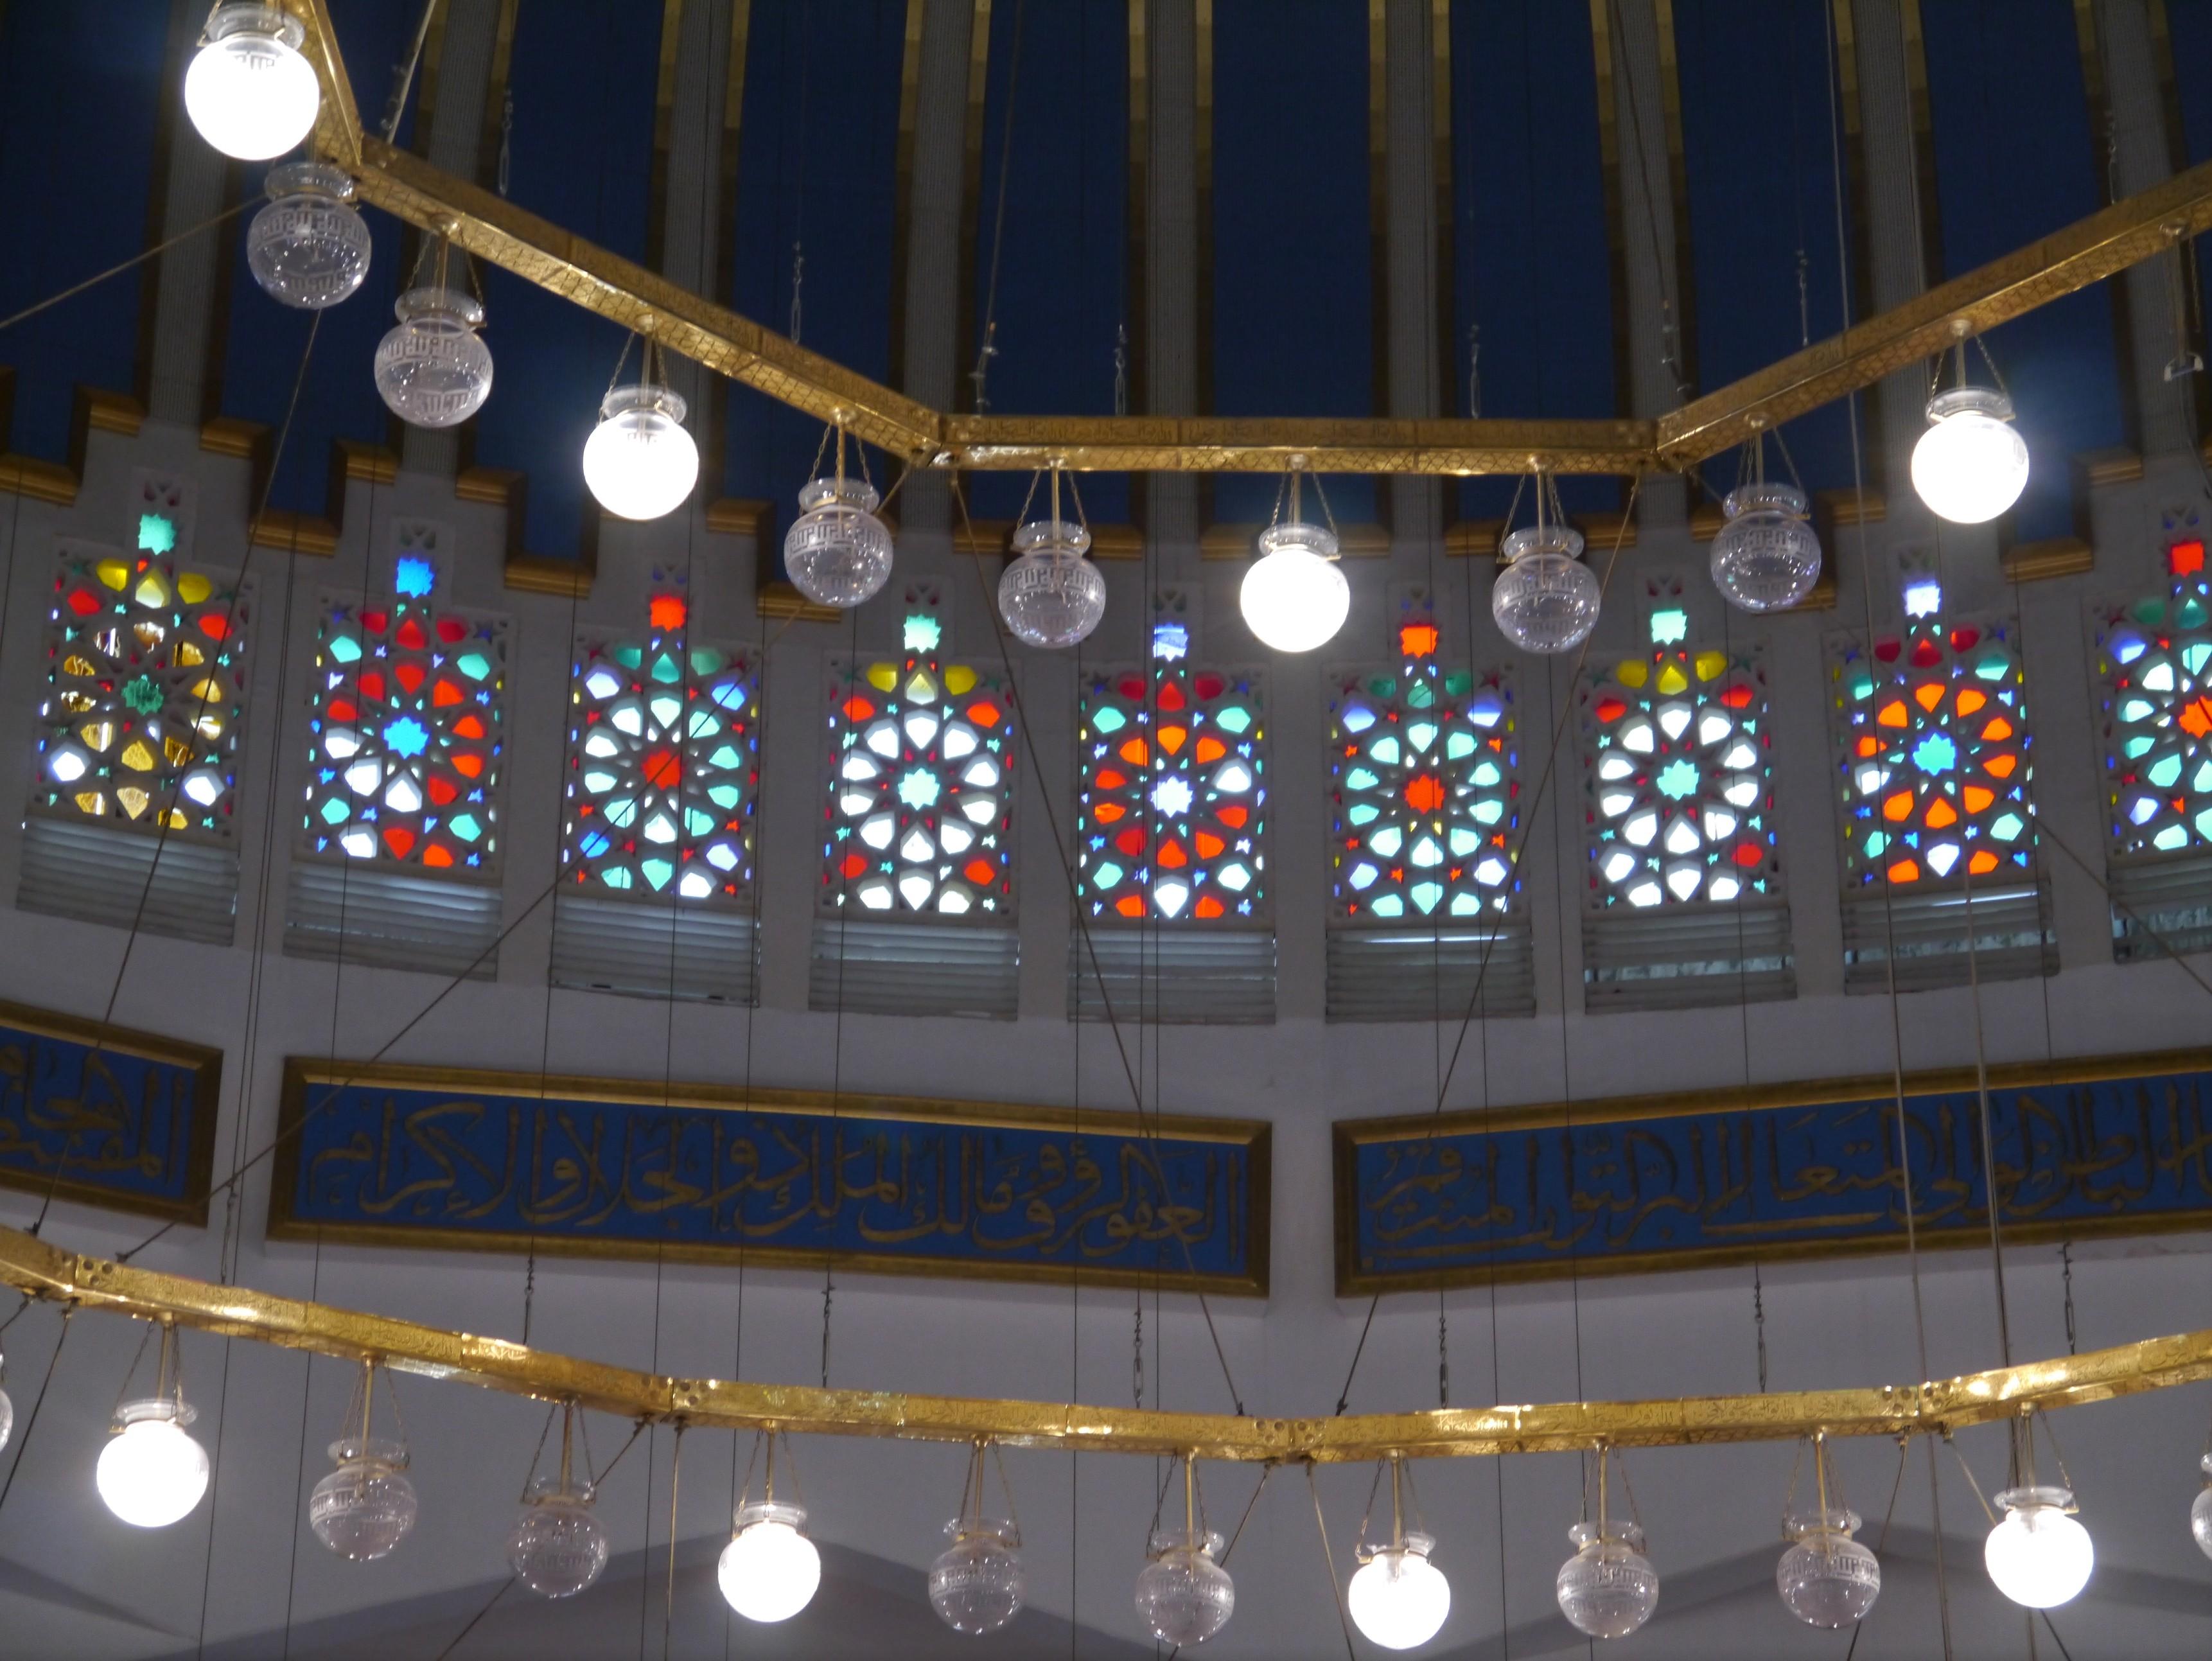 Fenster König file amman könig abdullah moschee innen fenster jpg wikimedia commons